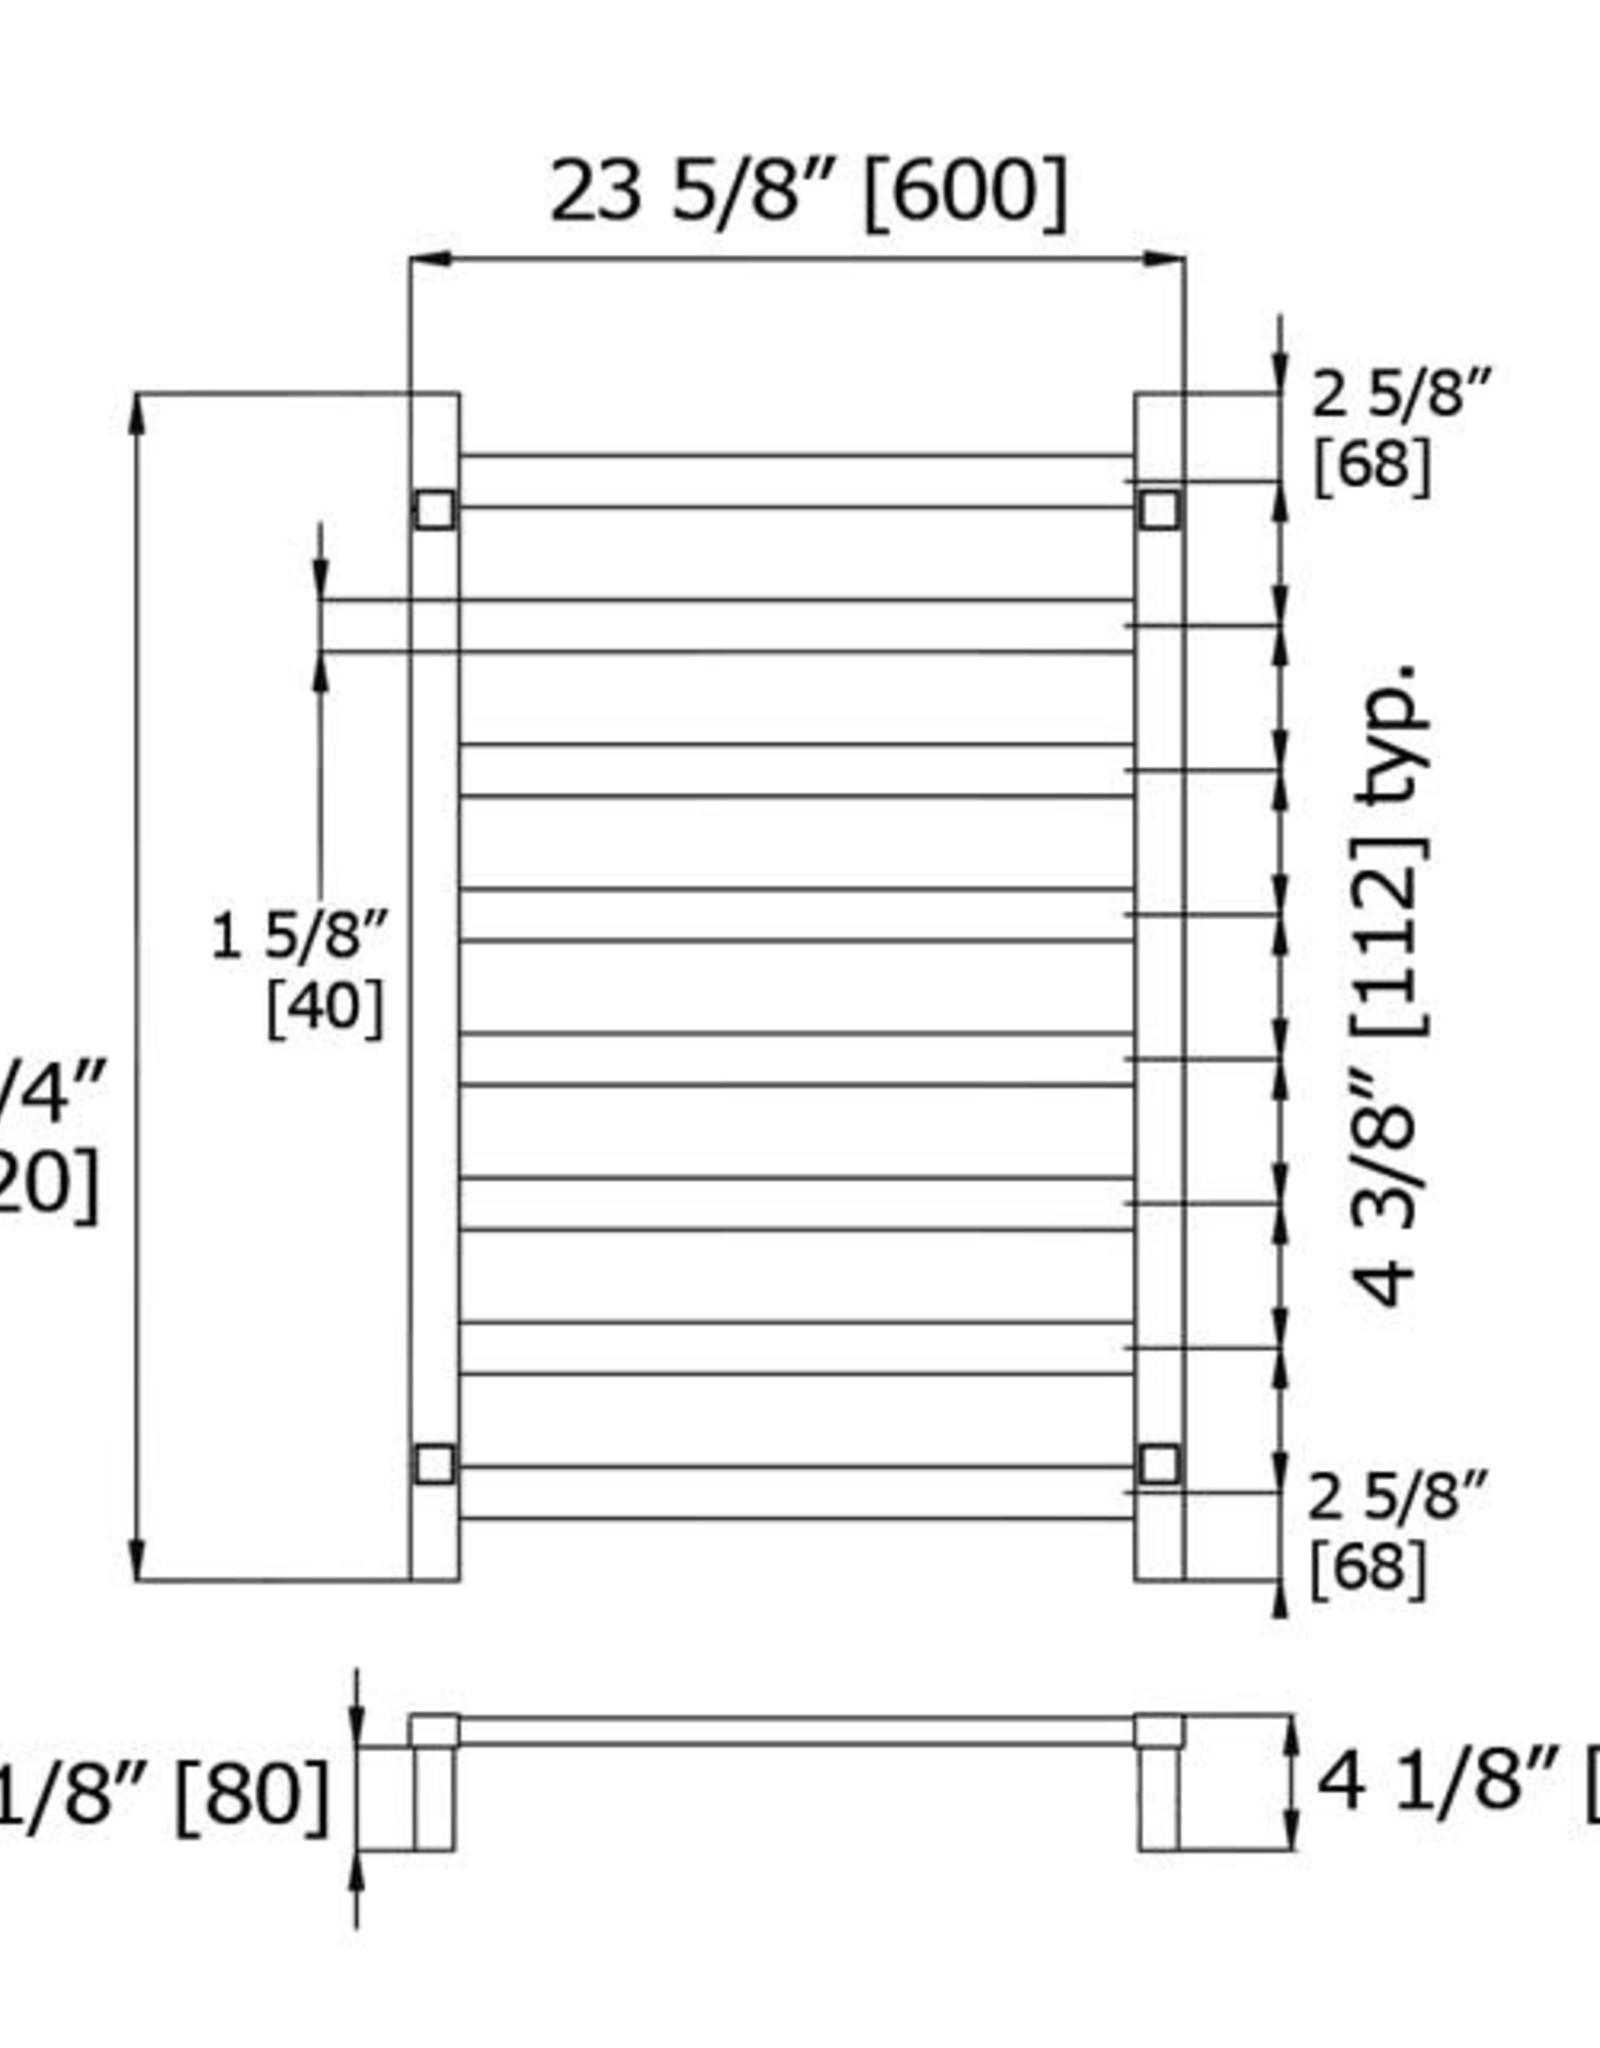 LalOO Laloo Multi-function 10-Bar Towel Warmer